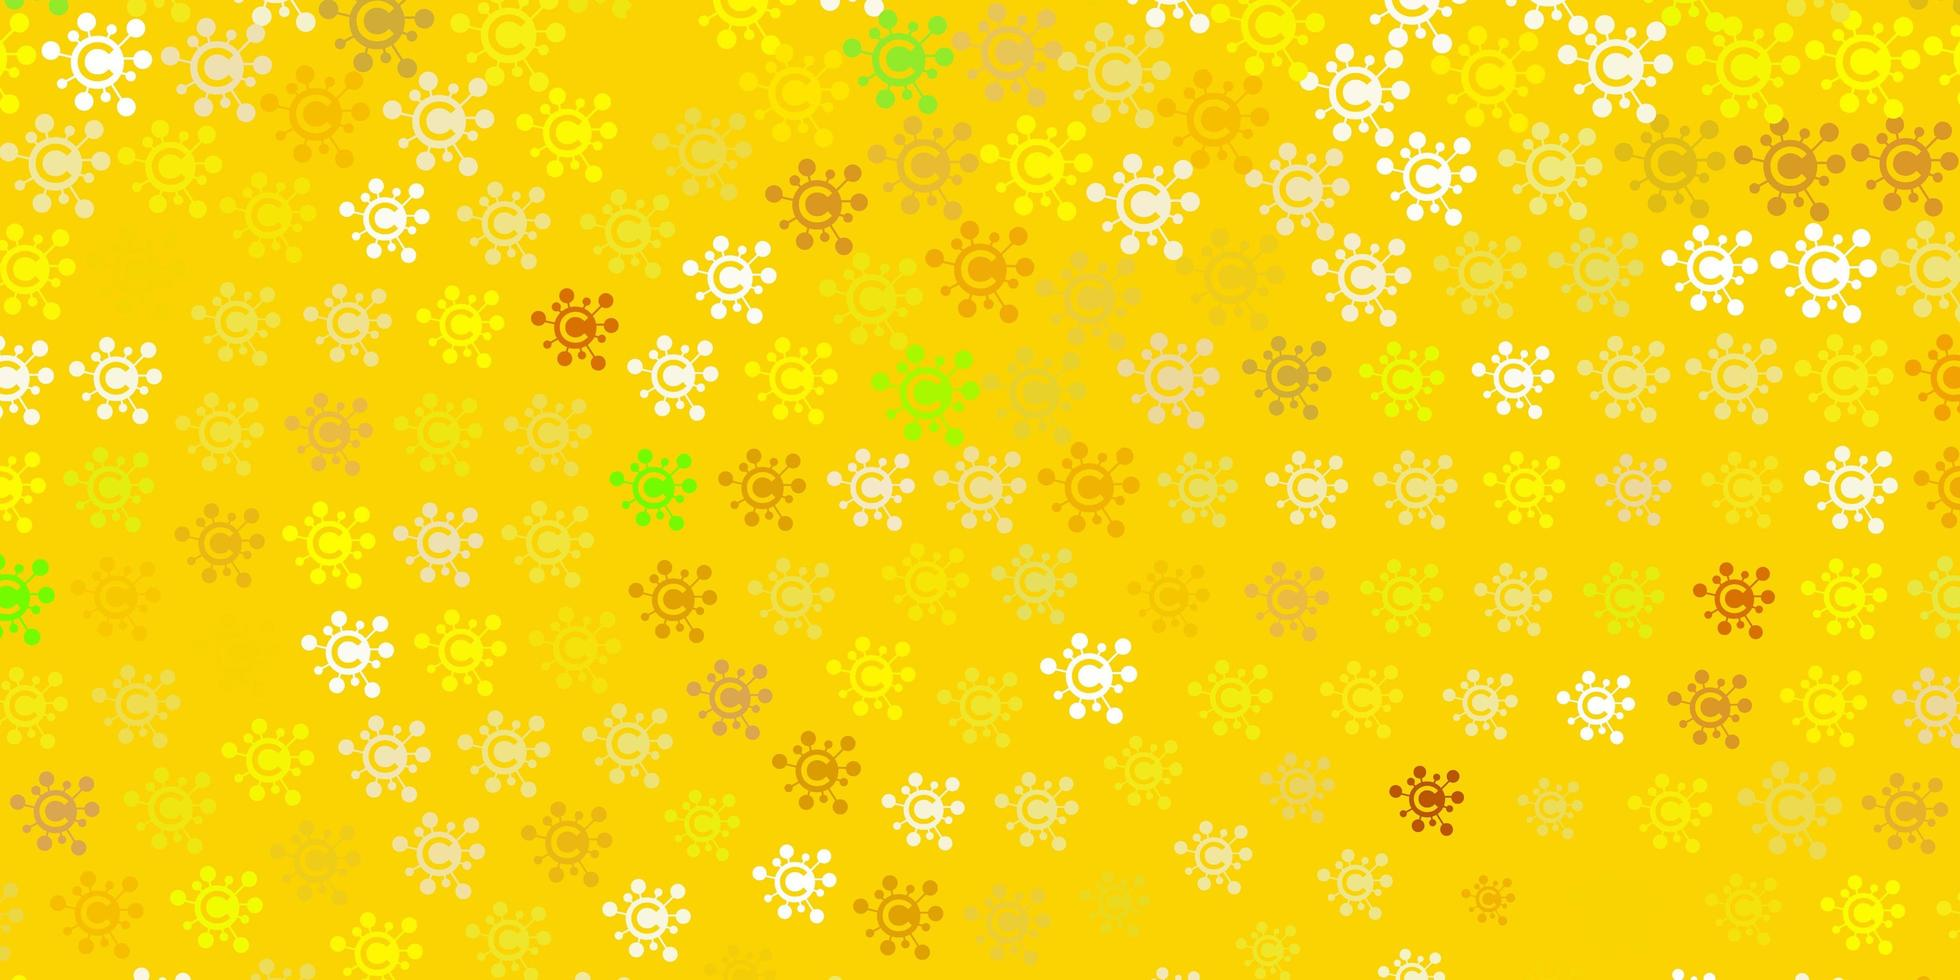 hellgrüner, gelber Vektorhintergrund mit covid-19 Symbolen. vektor